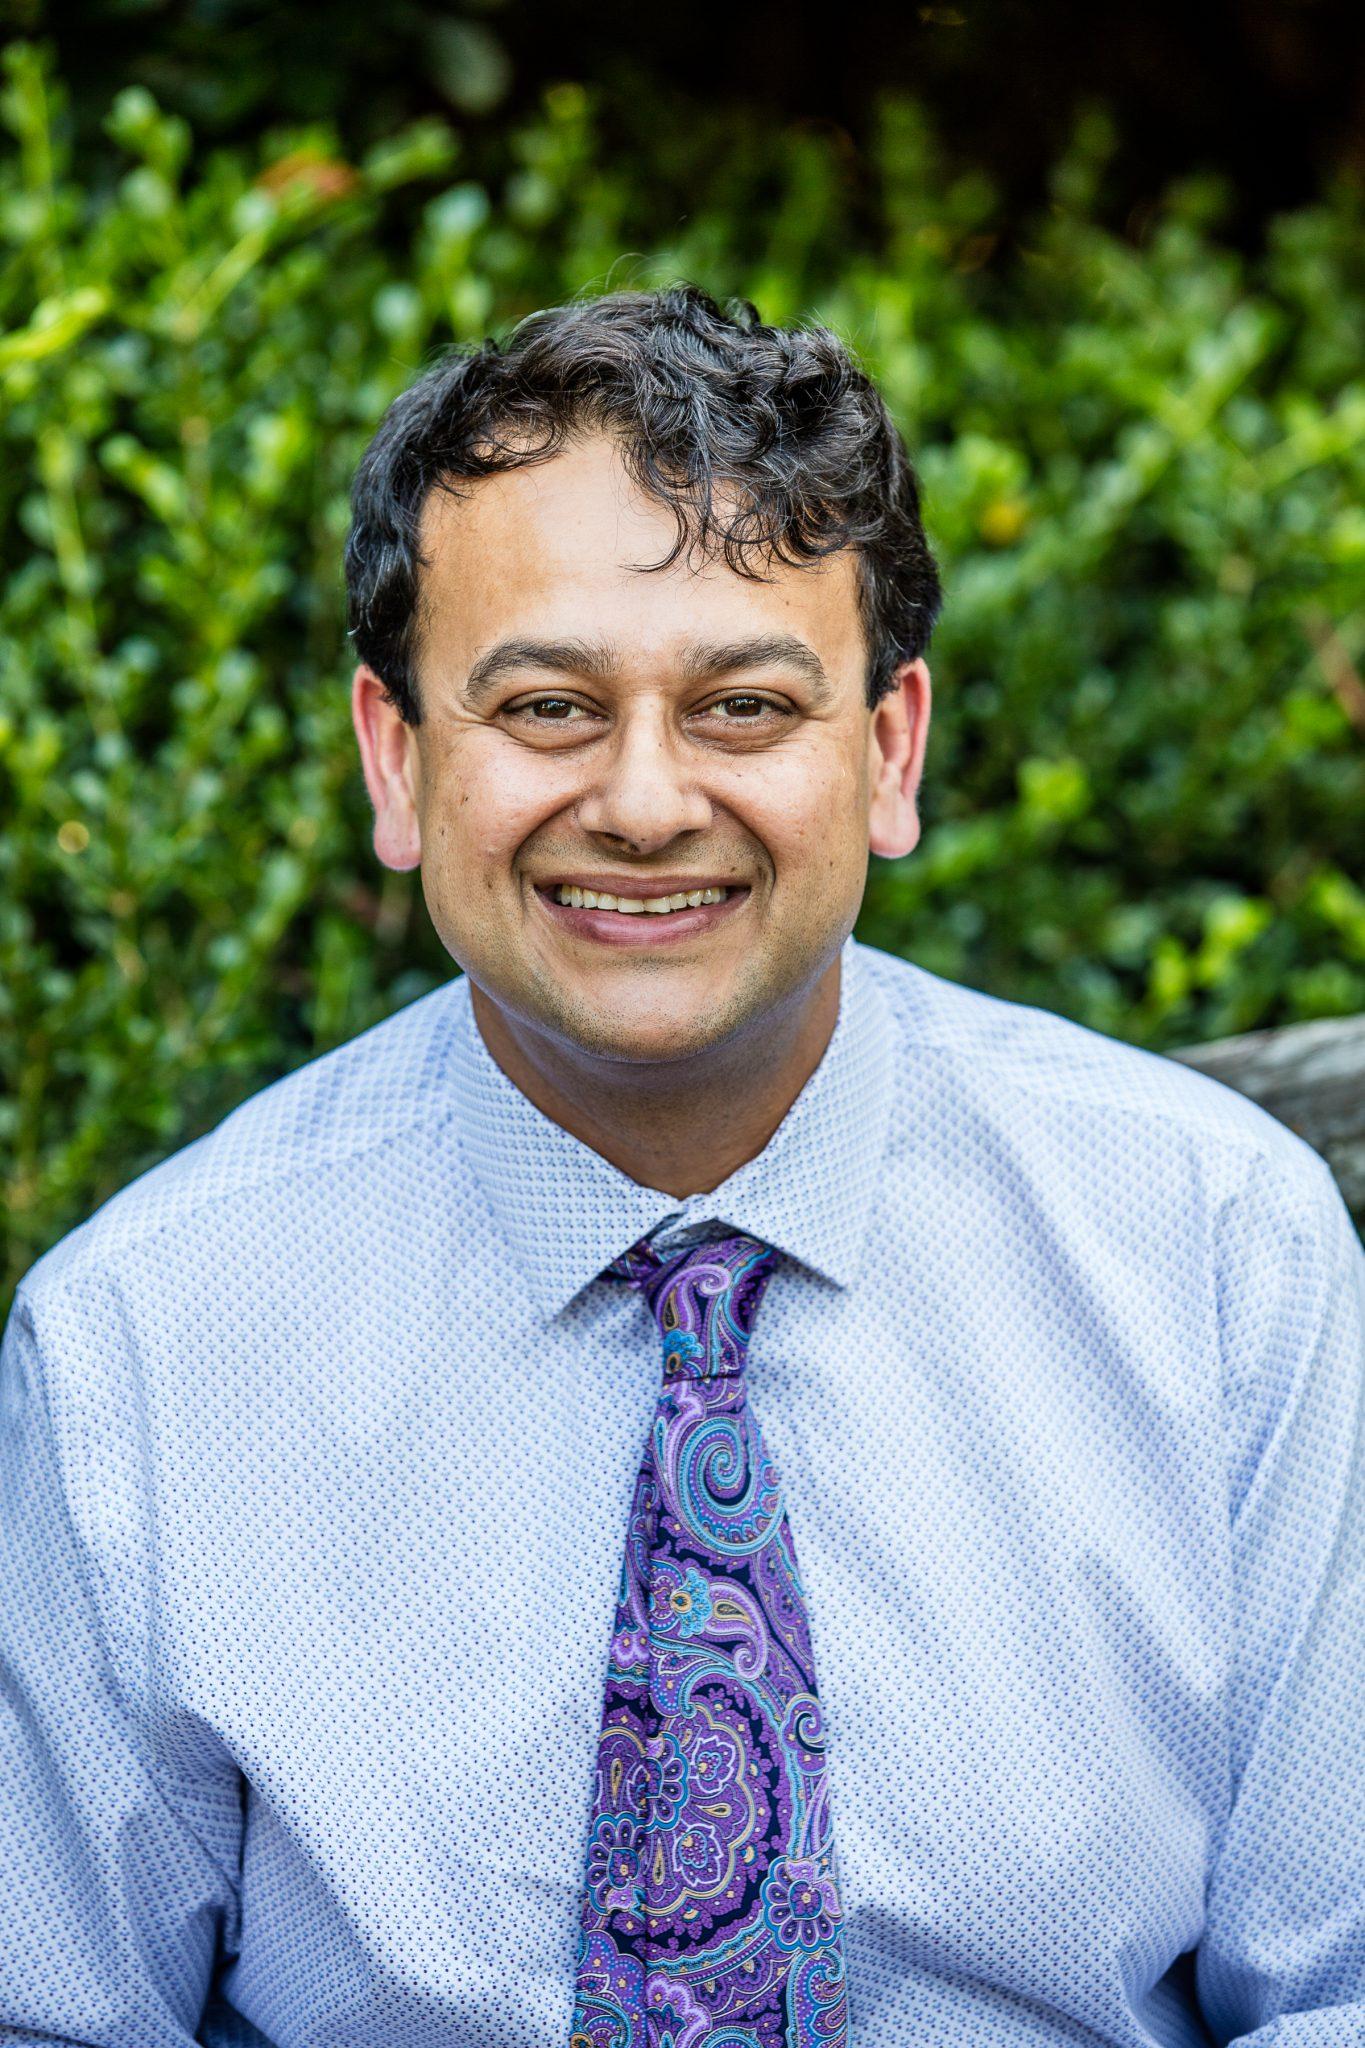 Dr. Bhasin, Central Georgia Periodontics & Dental Implants